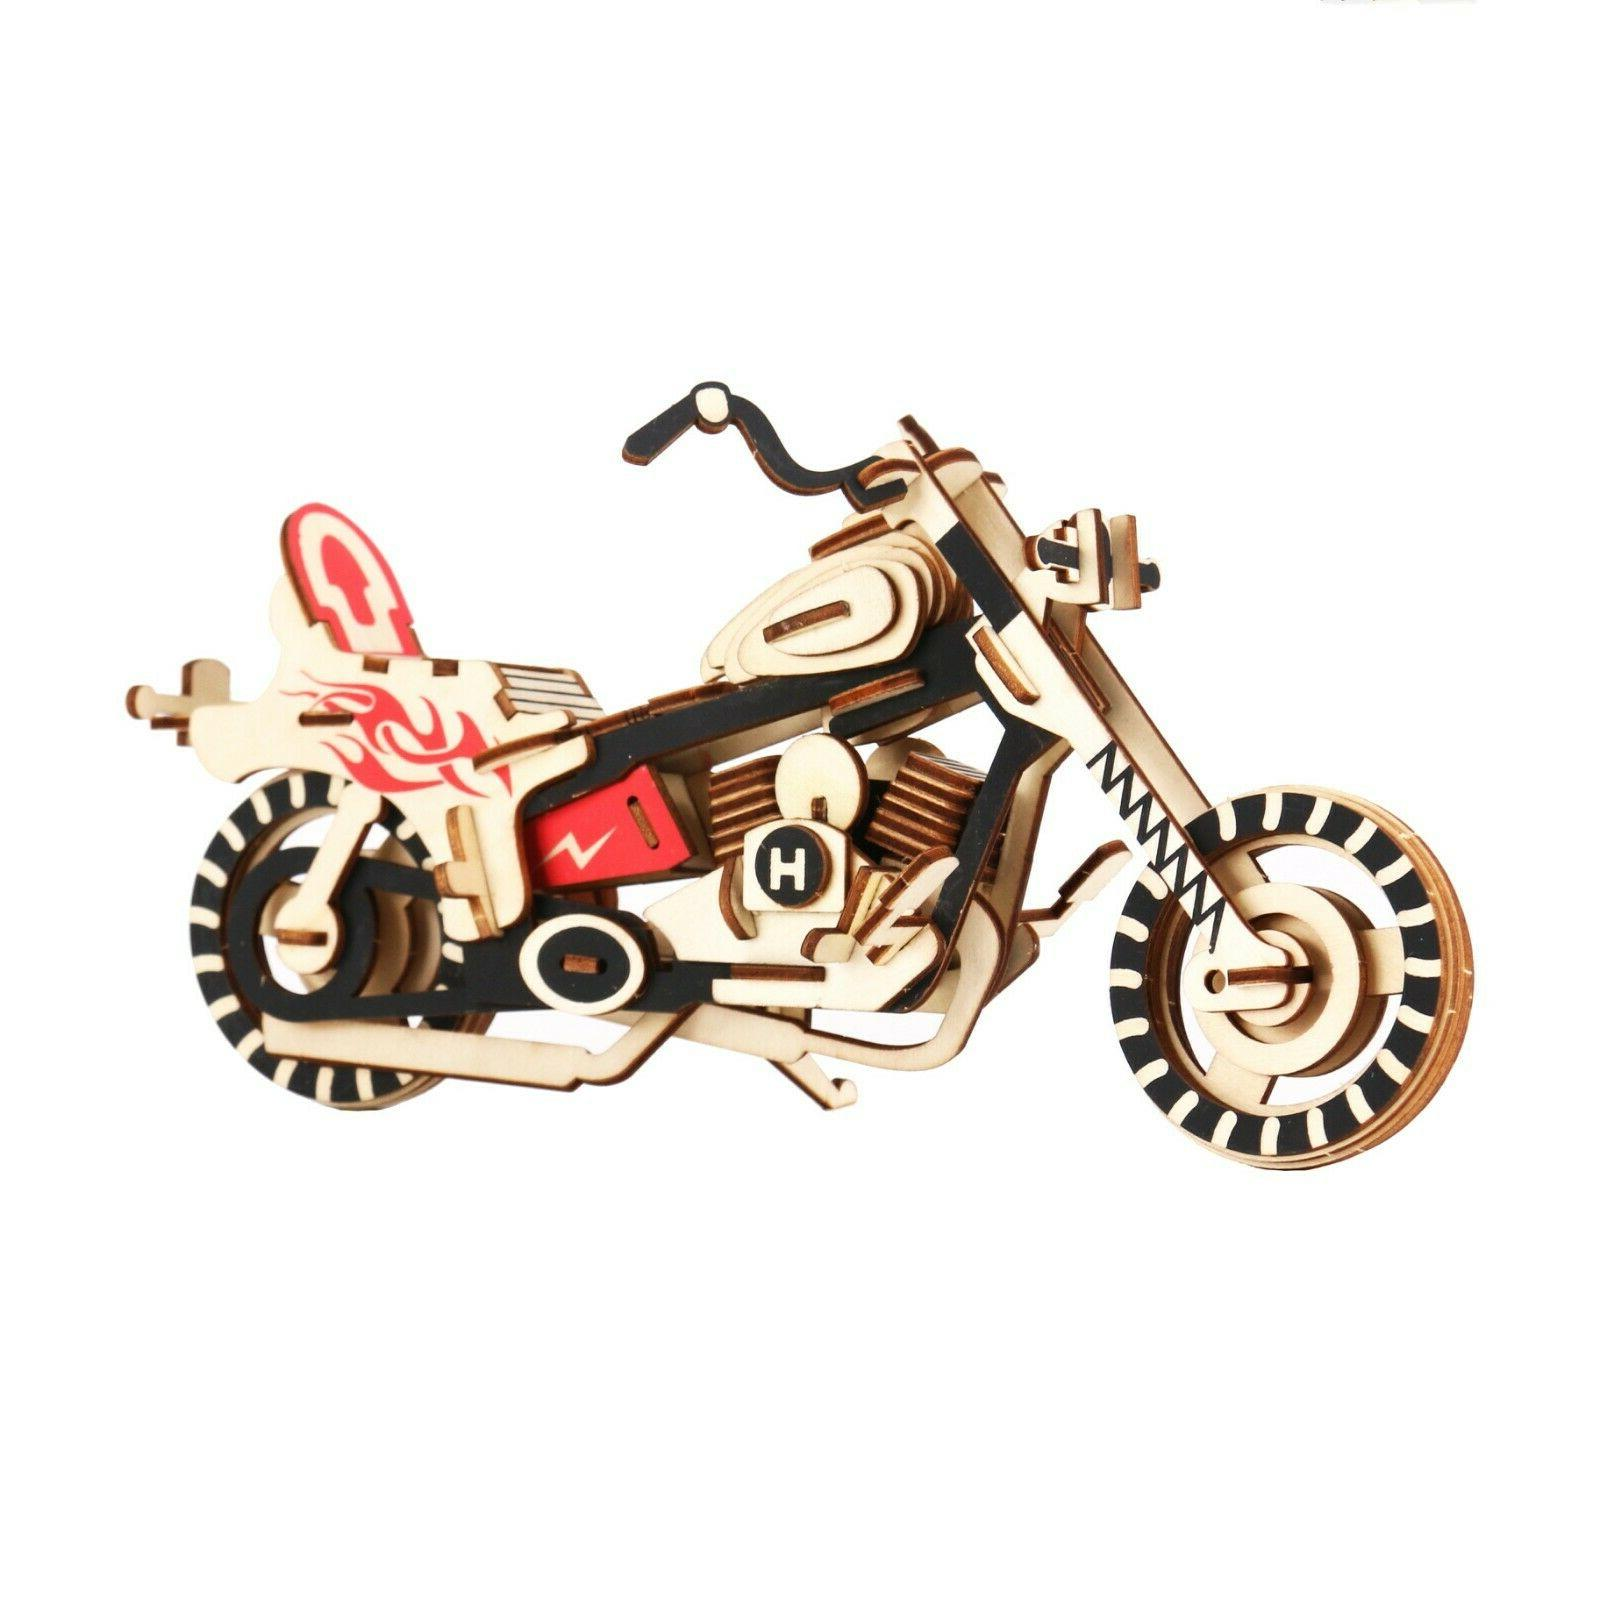 3D Wooden Model DIY Educational Great Gift Children &